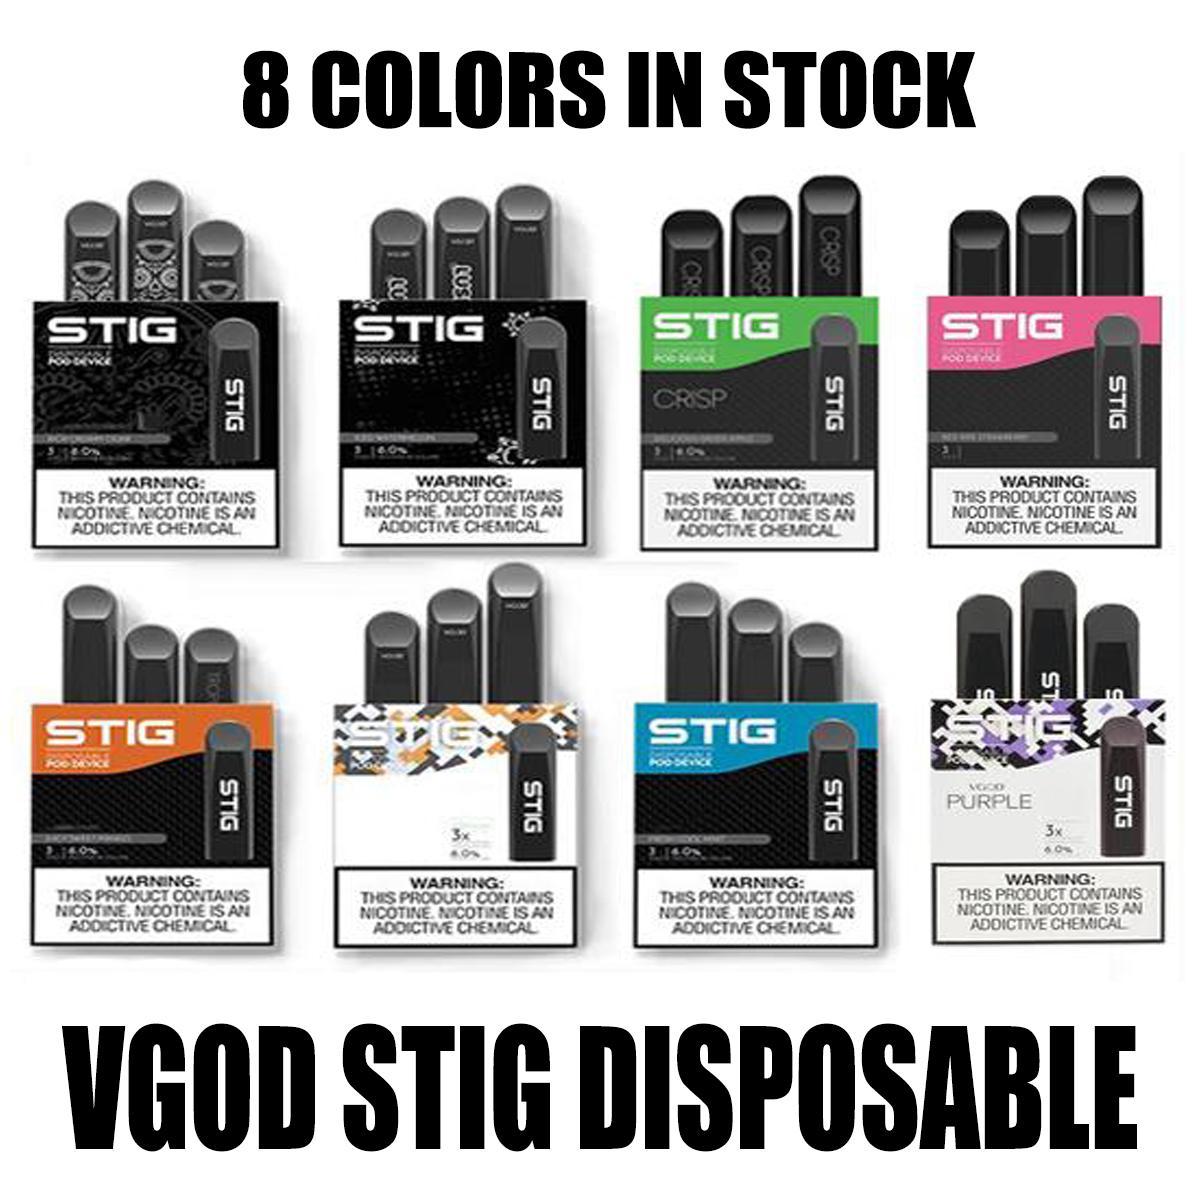 100% Original Vgod Stig Einweg-Pod-Gerät 3pcs Pack 270mAh-Batterie 1.2ml-Patrone Vape Pen-Kit PK Eon-Stick